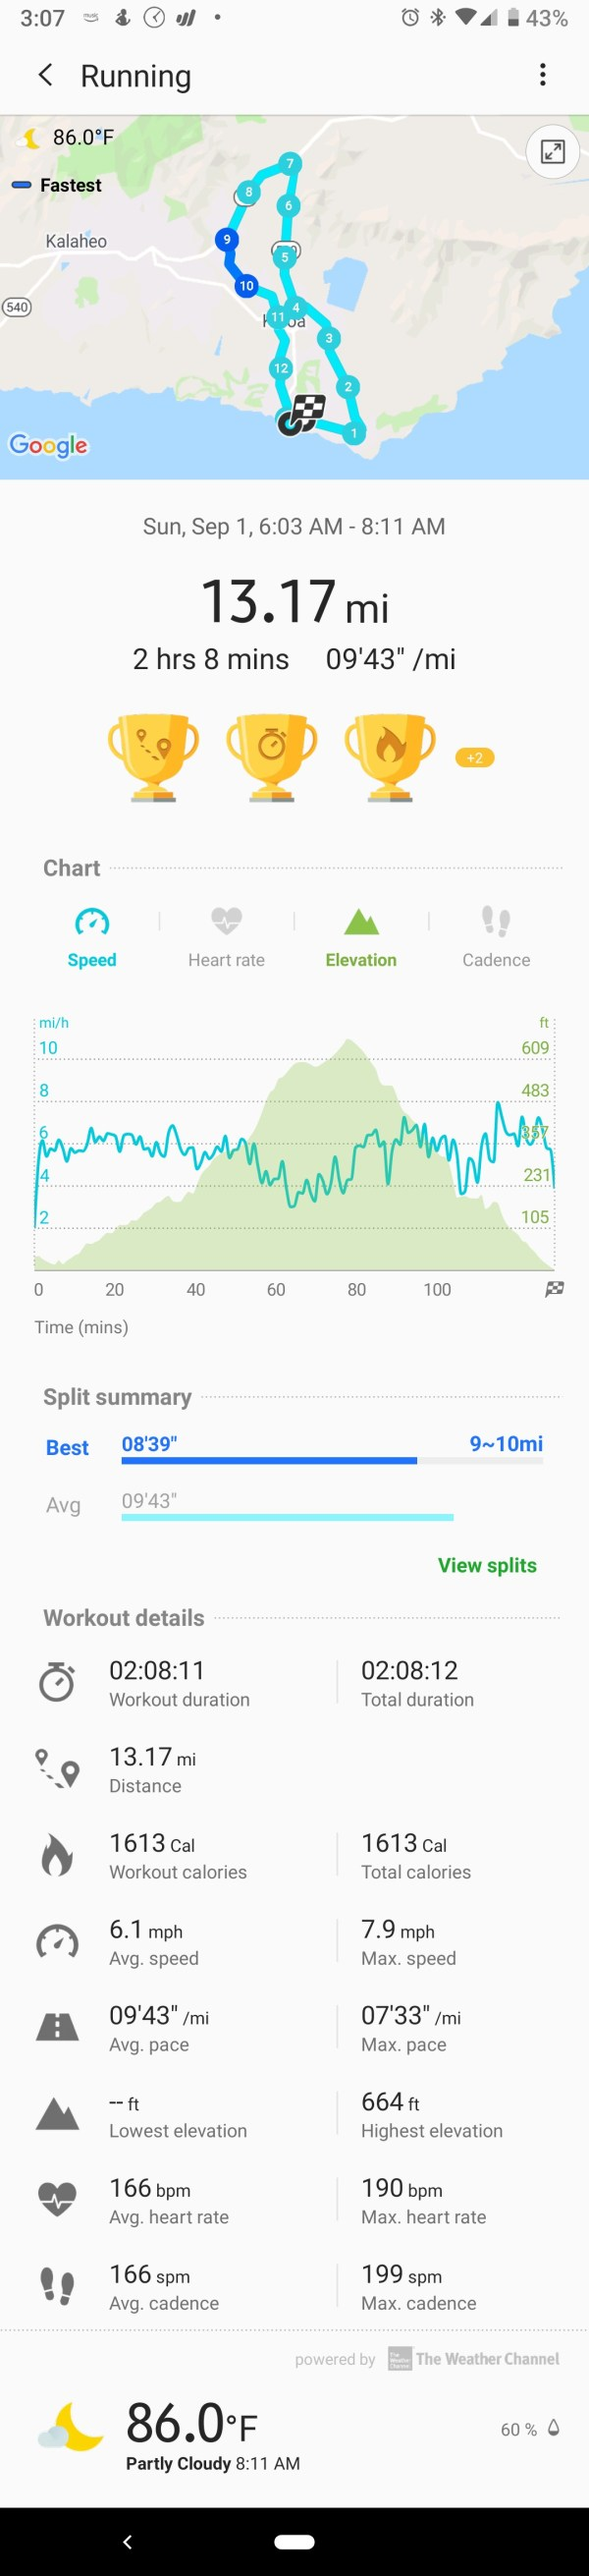 Kauai Half Marathon Data from smartwatch1